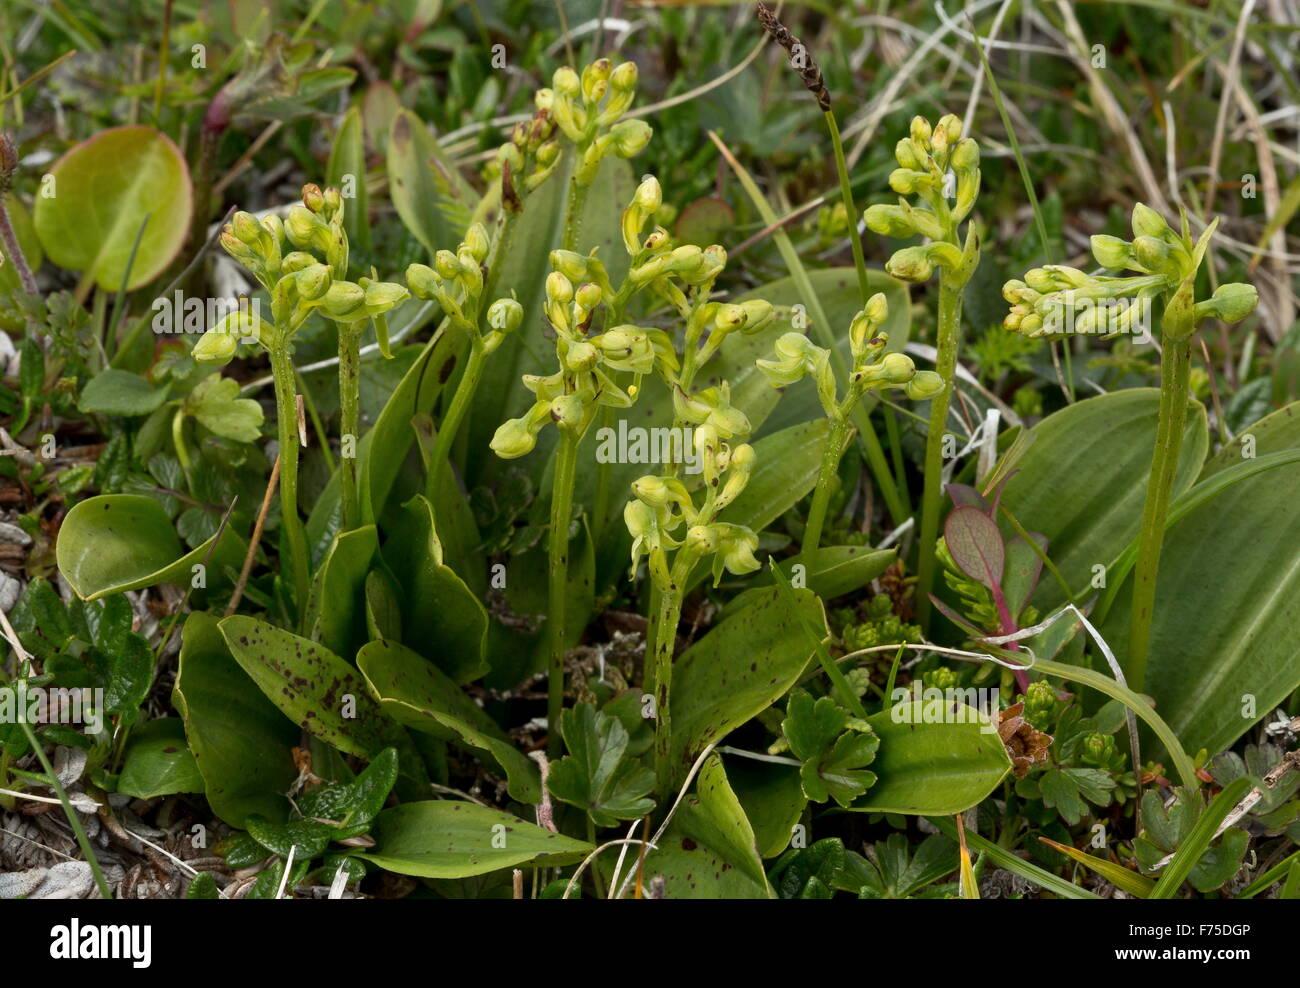 Group of Blunt-leaf rein orchids, Platanthera obtusata in tundra, Newfoundland - Stock Image